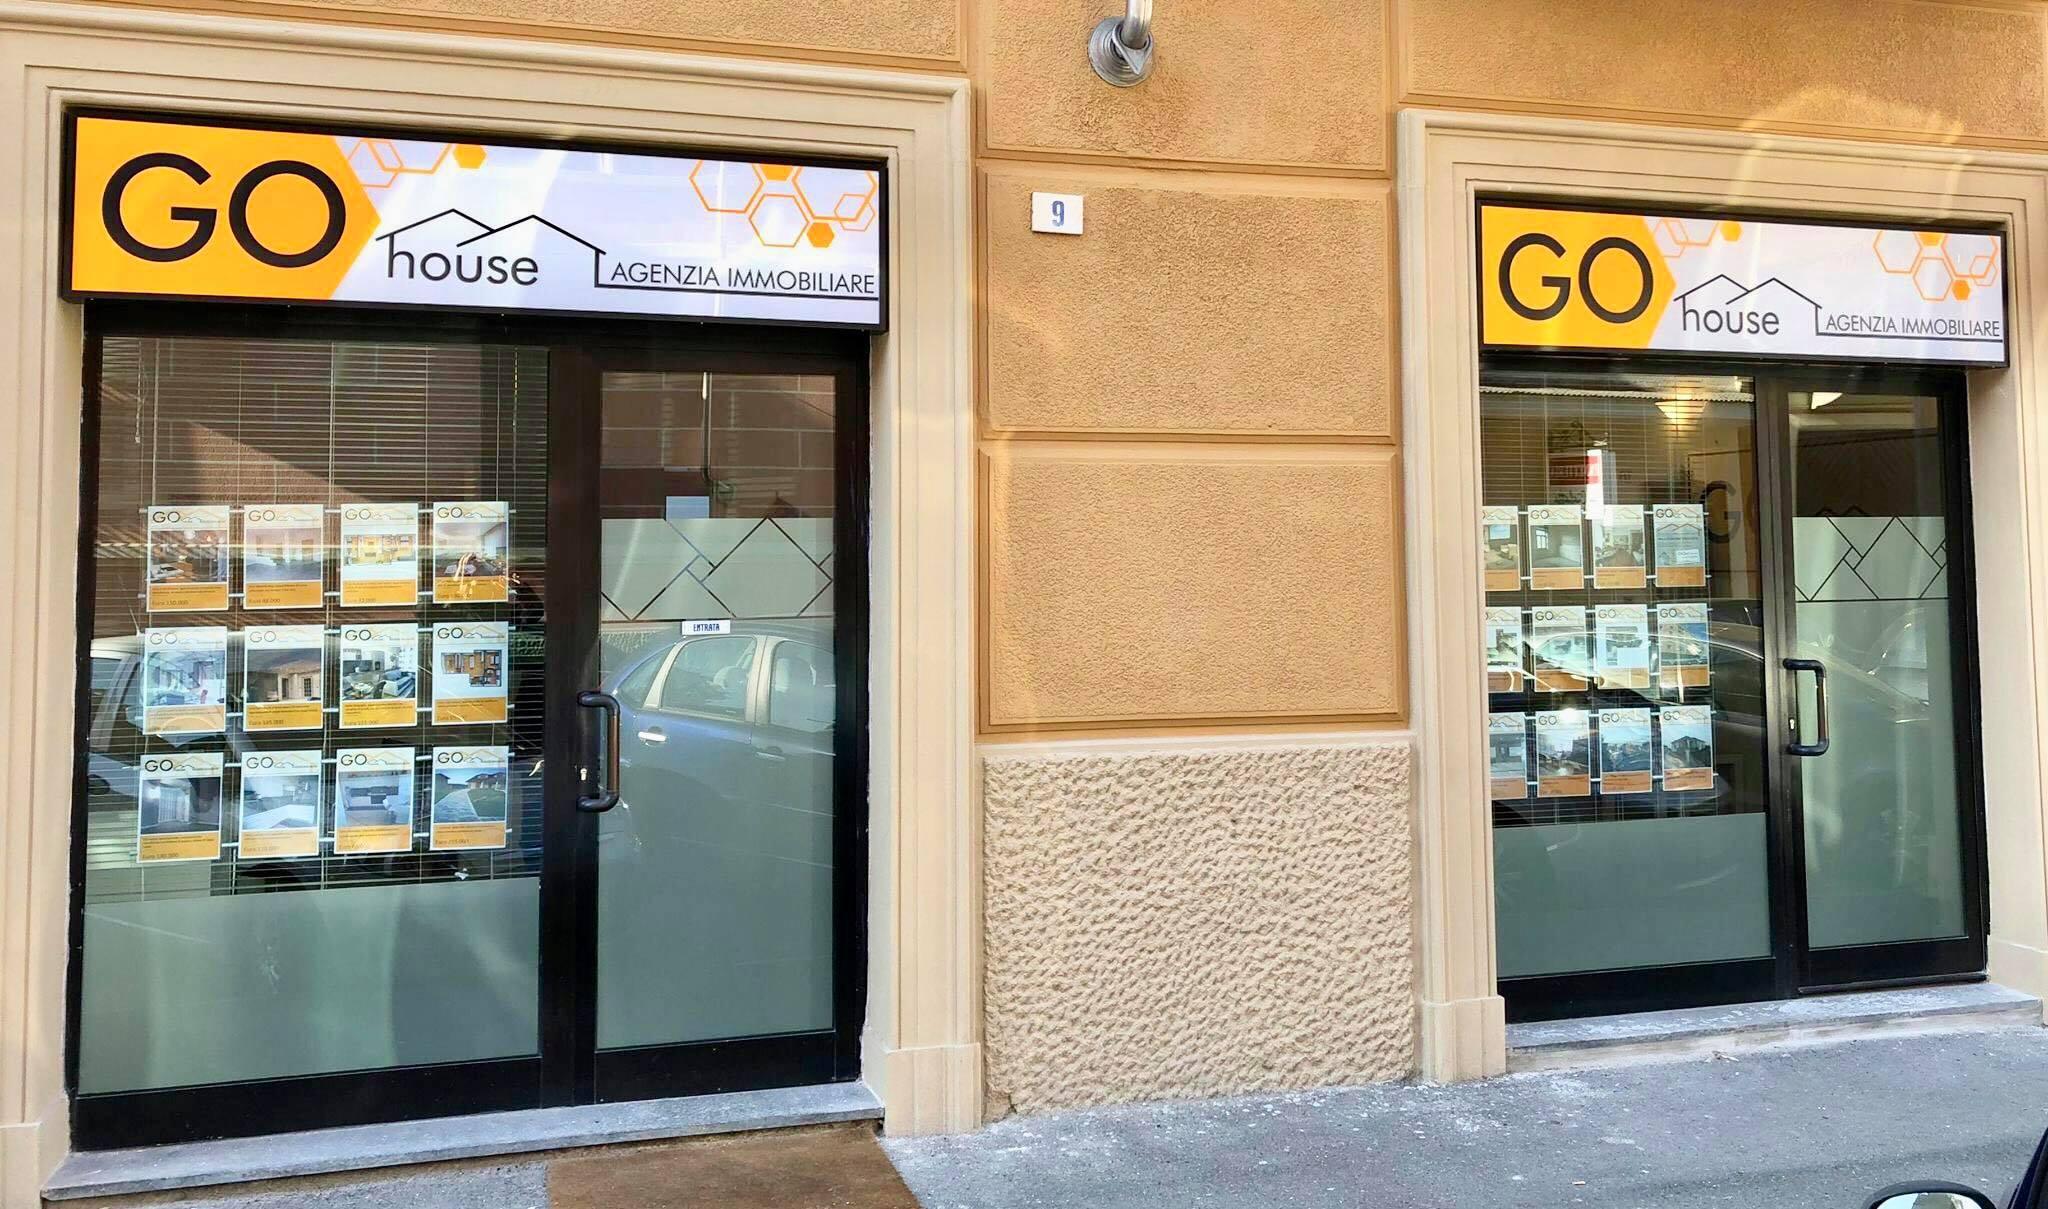 Agenzie Immobiliari Varazze gohouse varazze - immobiliare gohouse